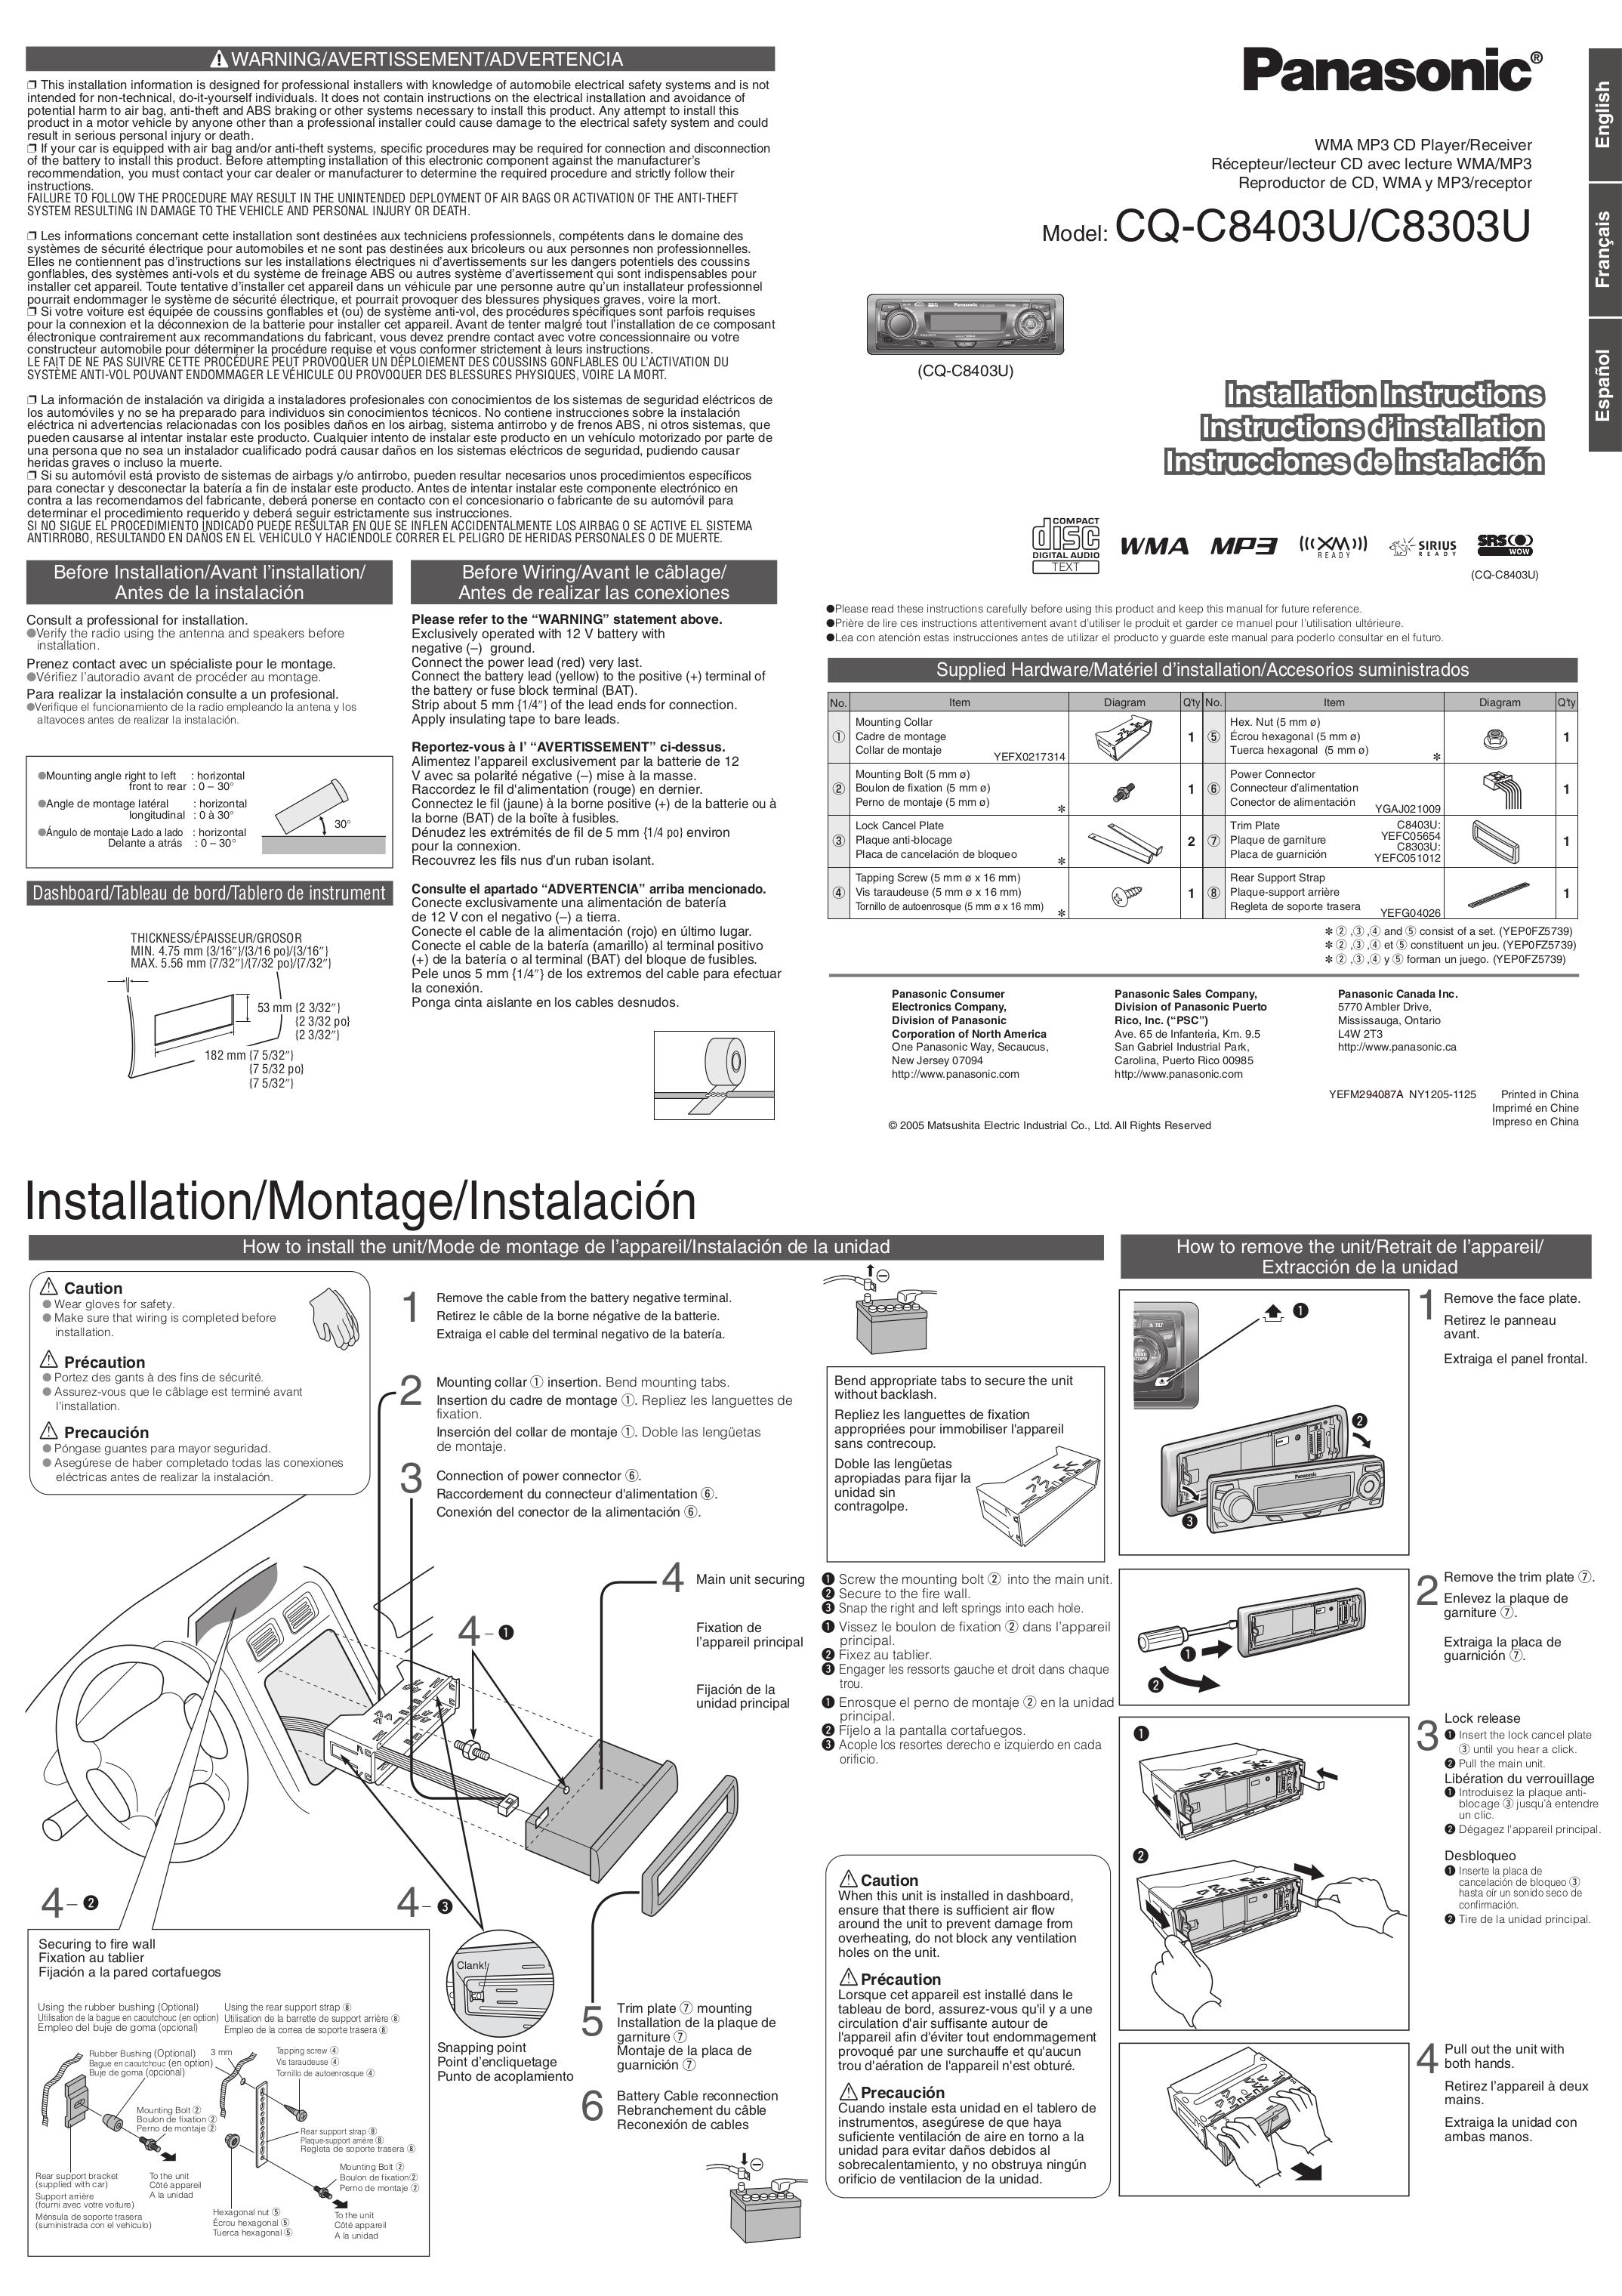 Panasonic Udqt36el3 Wiring Diagram